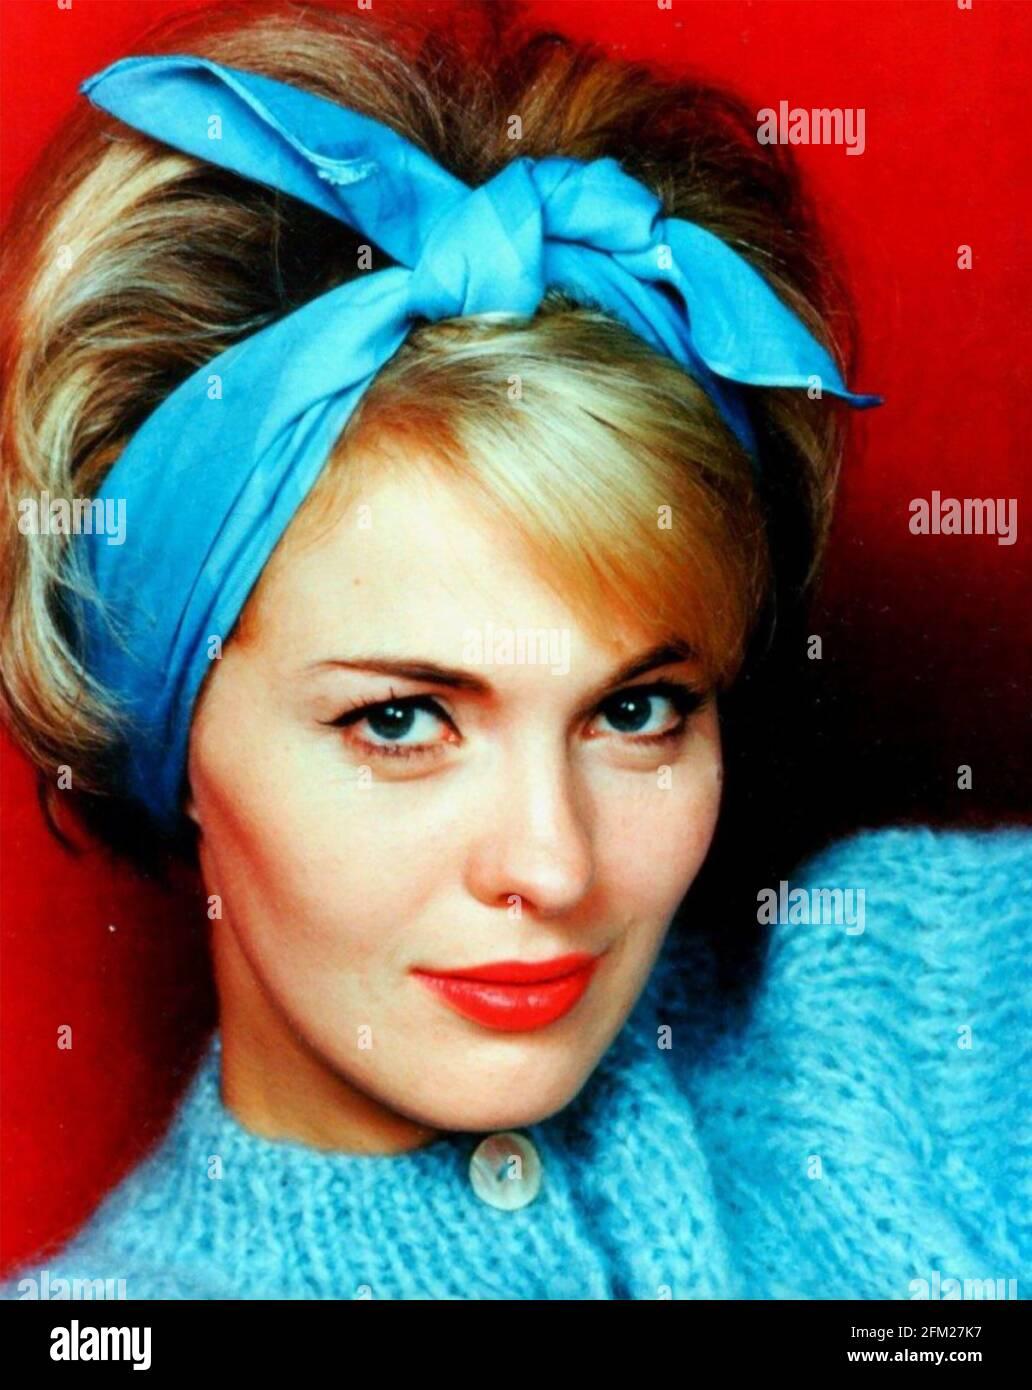 JEAN SEBERG (1938-1979) amerikanische Filmschauspielerin um 1965 Stockfoto